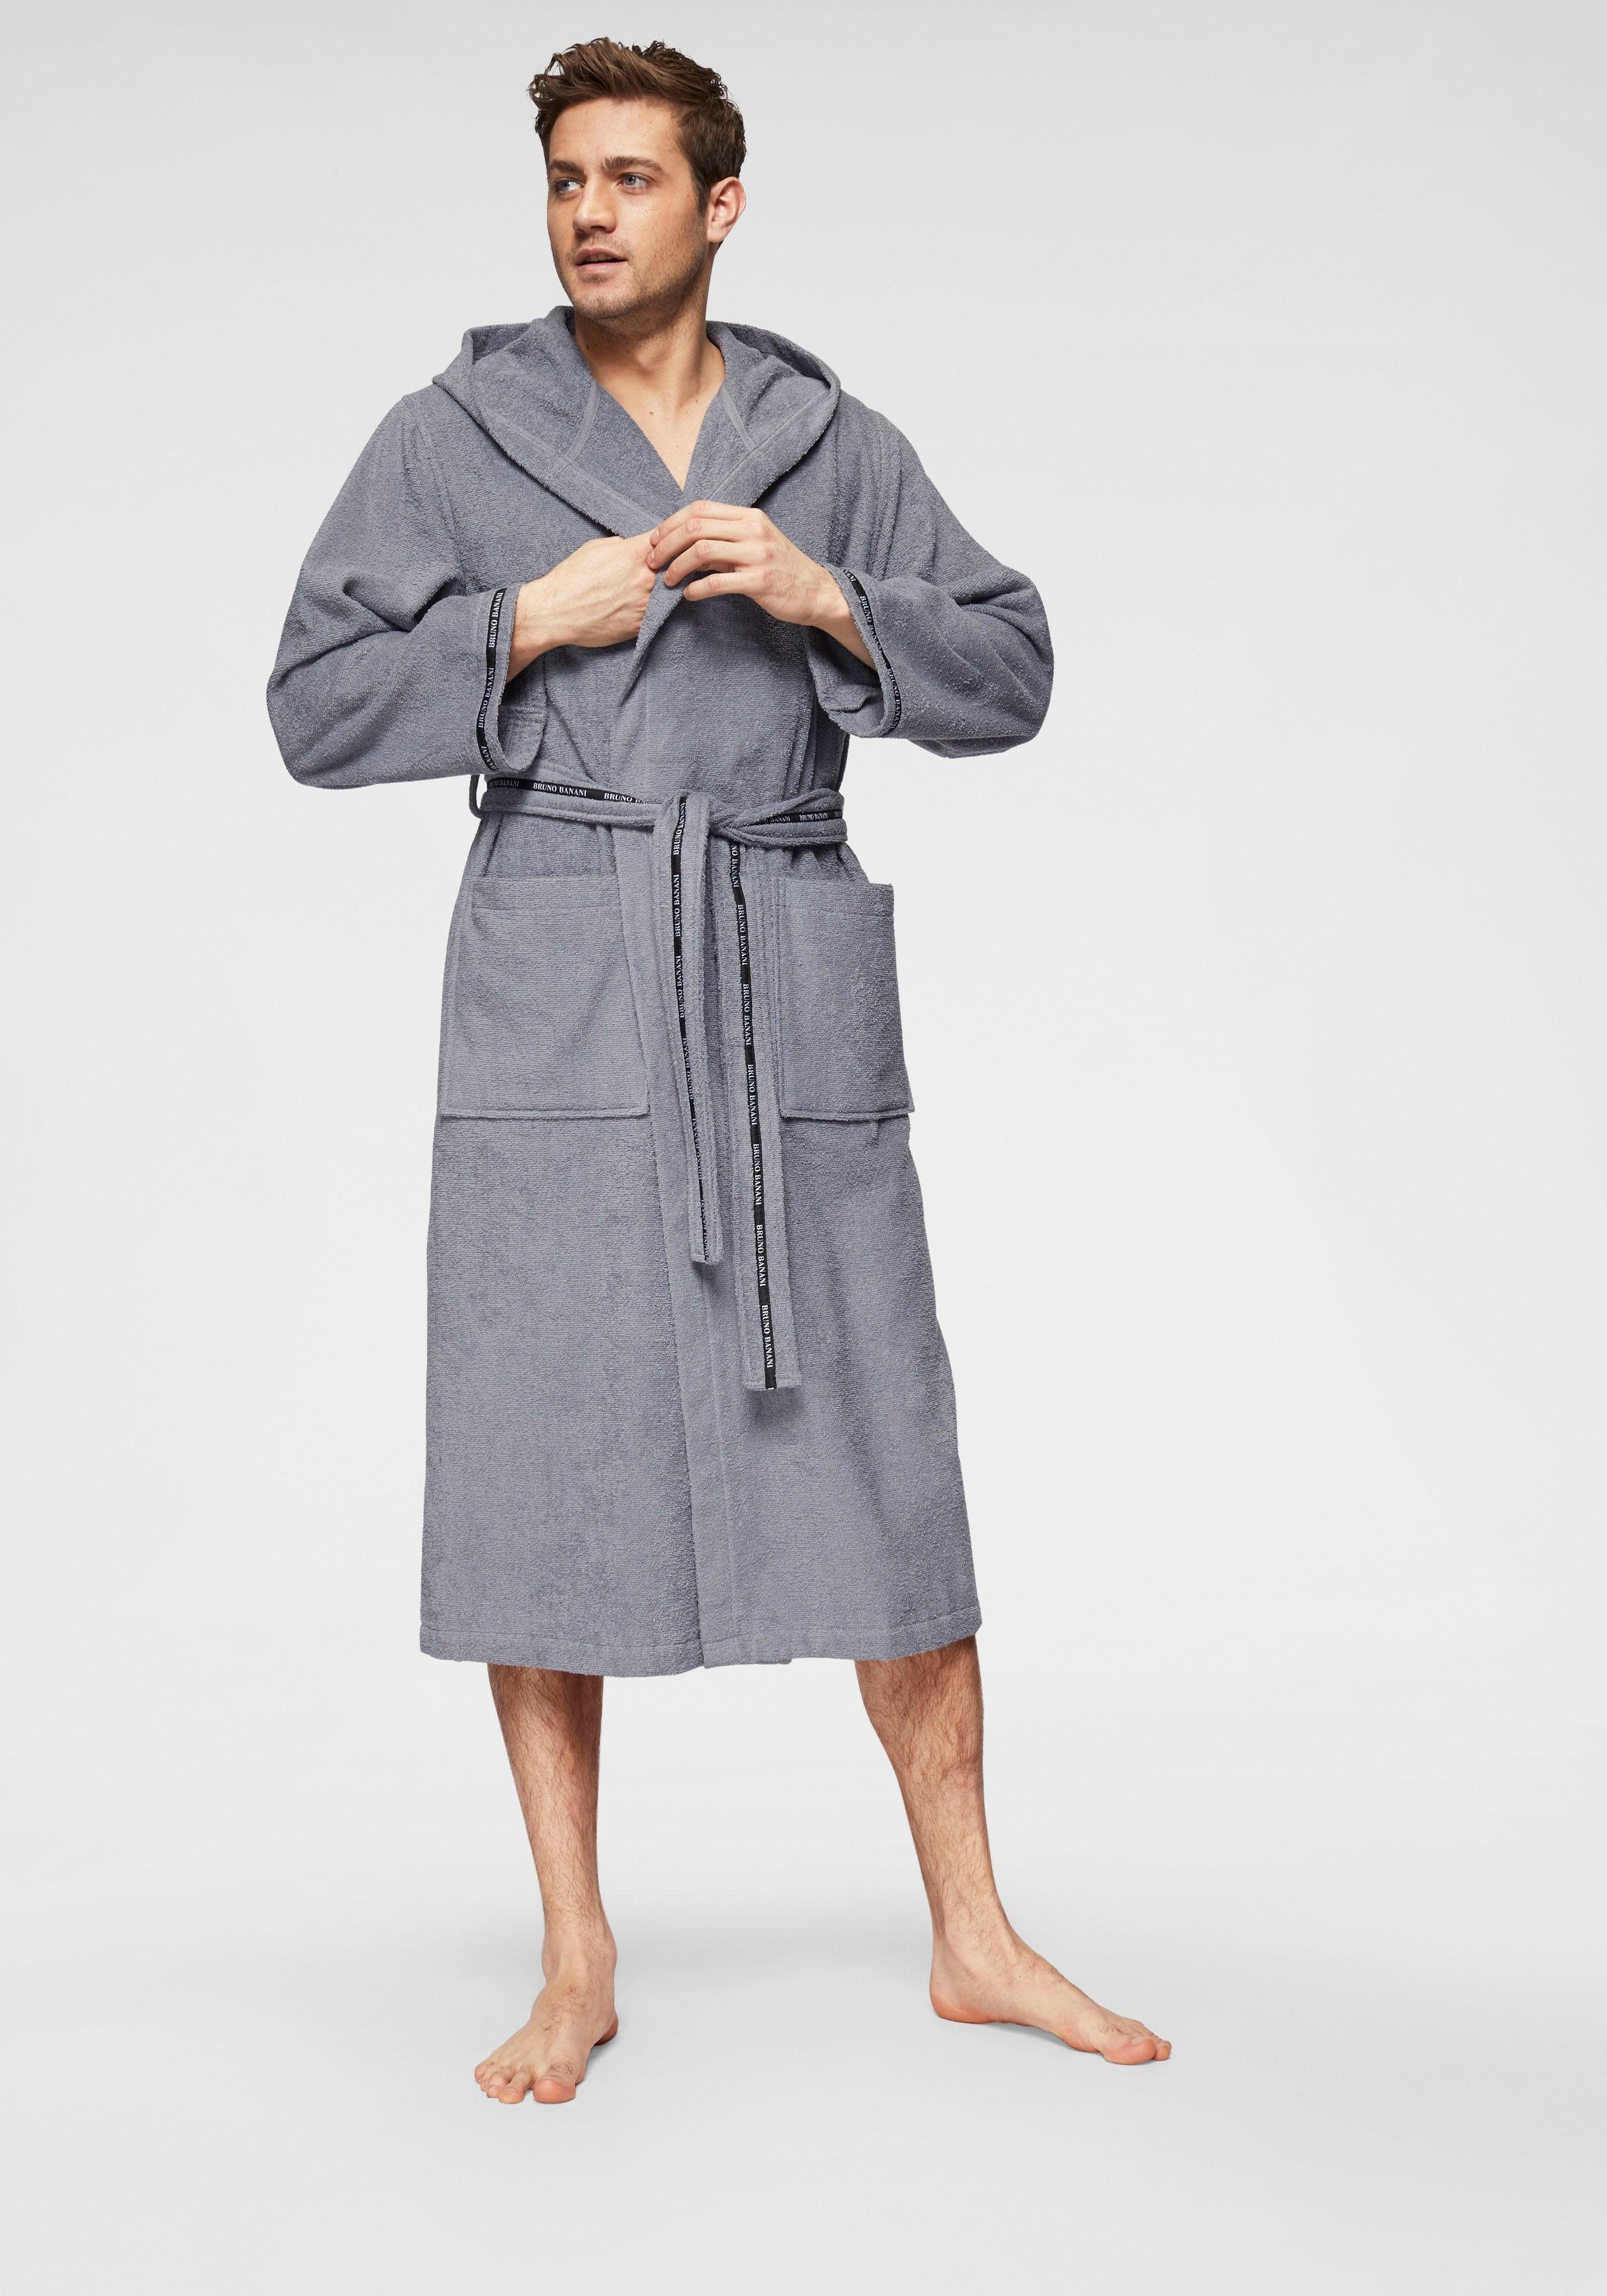 Herrenbademantel Danny Bruno Banani | Bekleidung > Wäsche > Bademäntel | Grau | Baumwolle | Bruno Banani